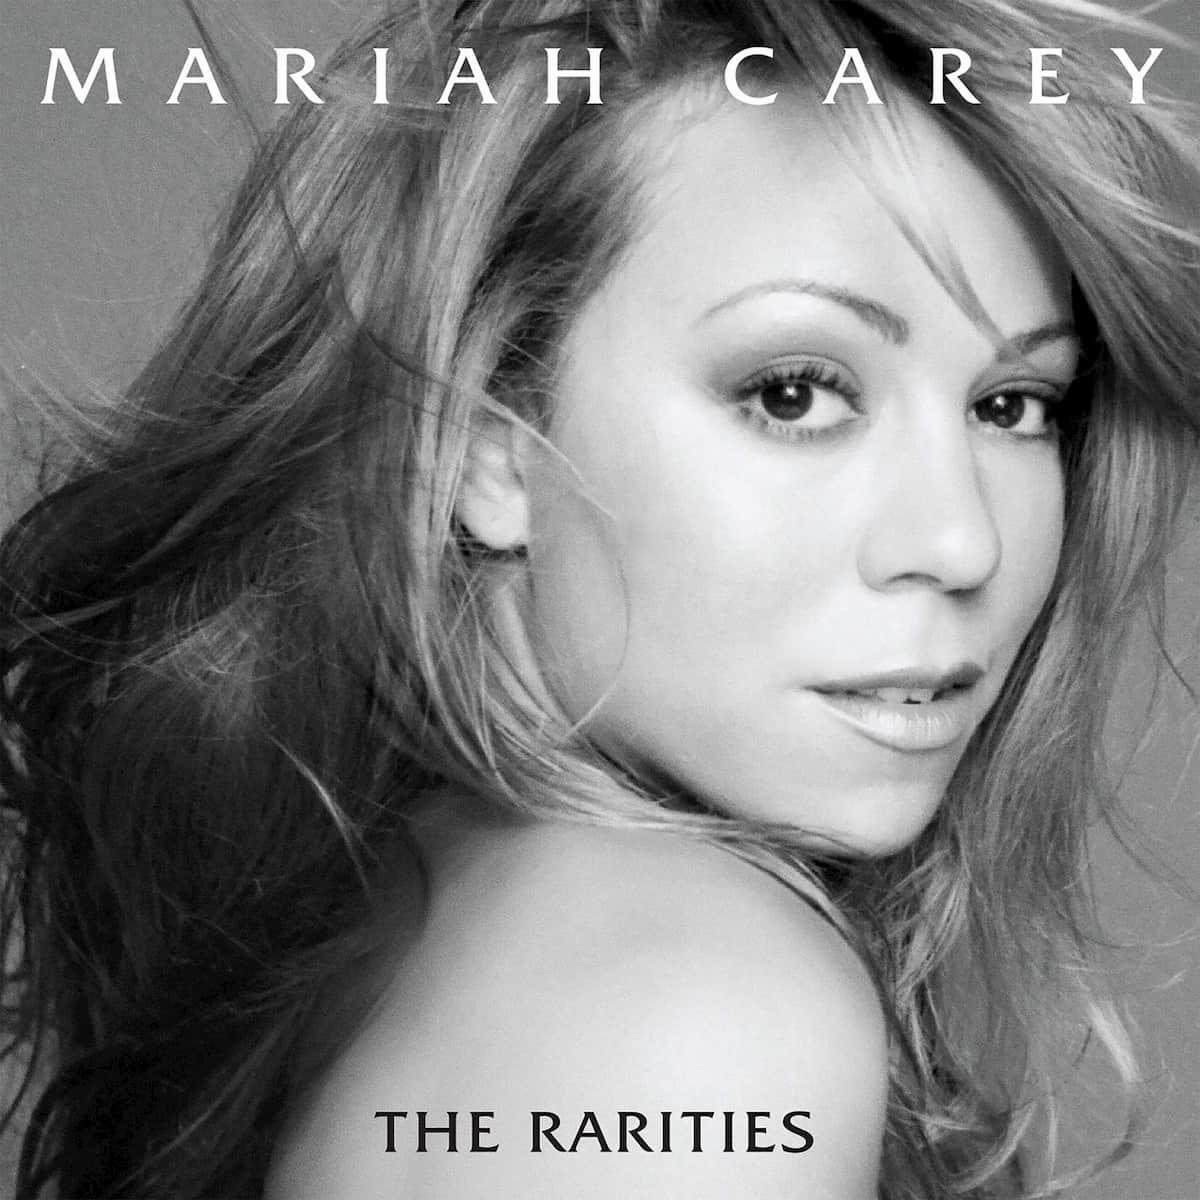 Mariah Carey Neues Album The Rarities veröffentlicht